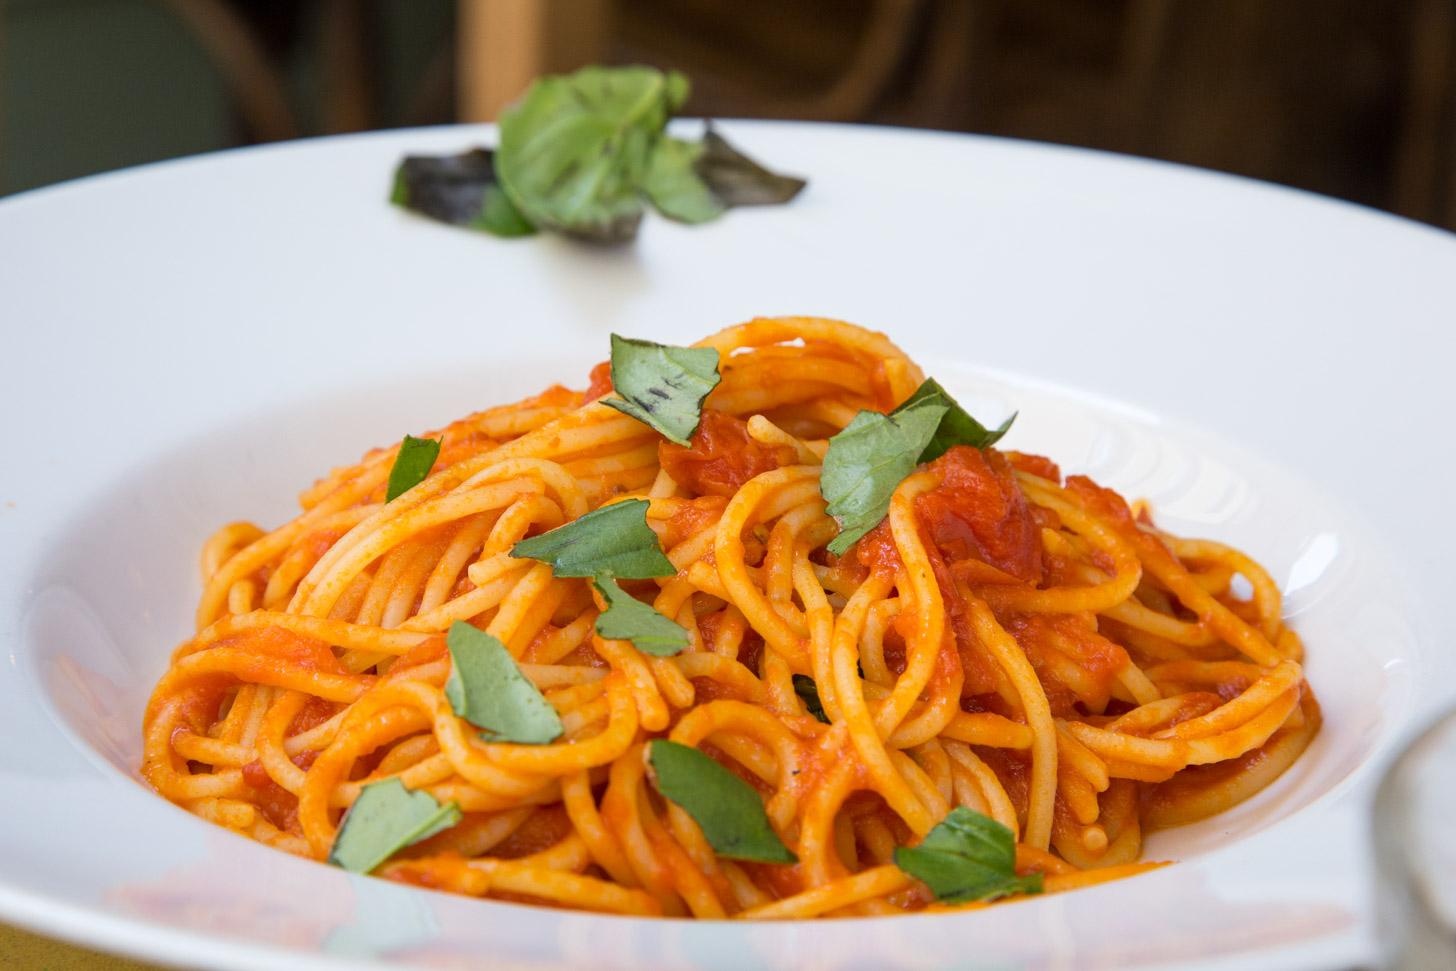 Overal in Rome kun je een goed bord pasta kopen.